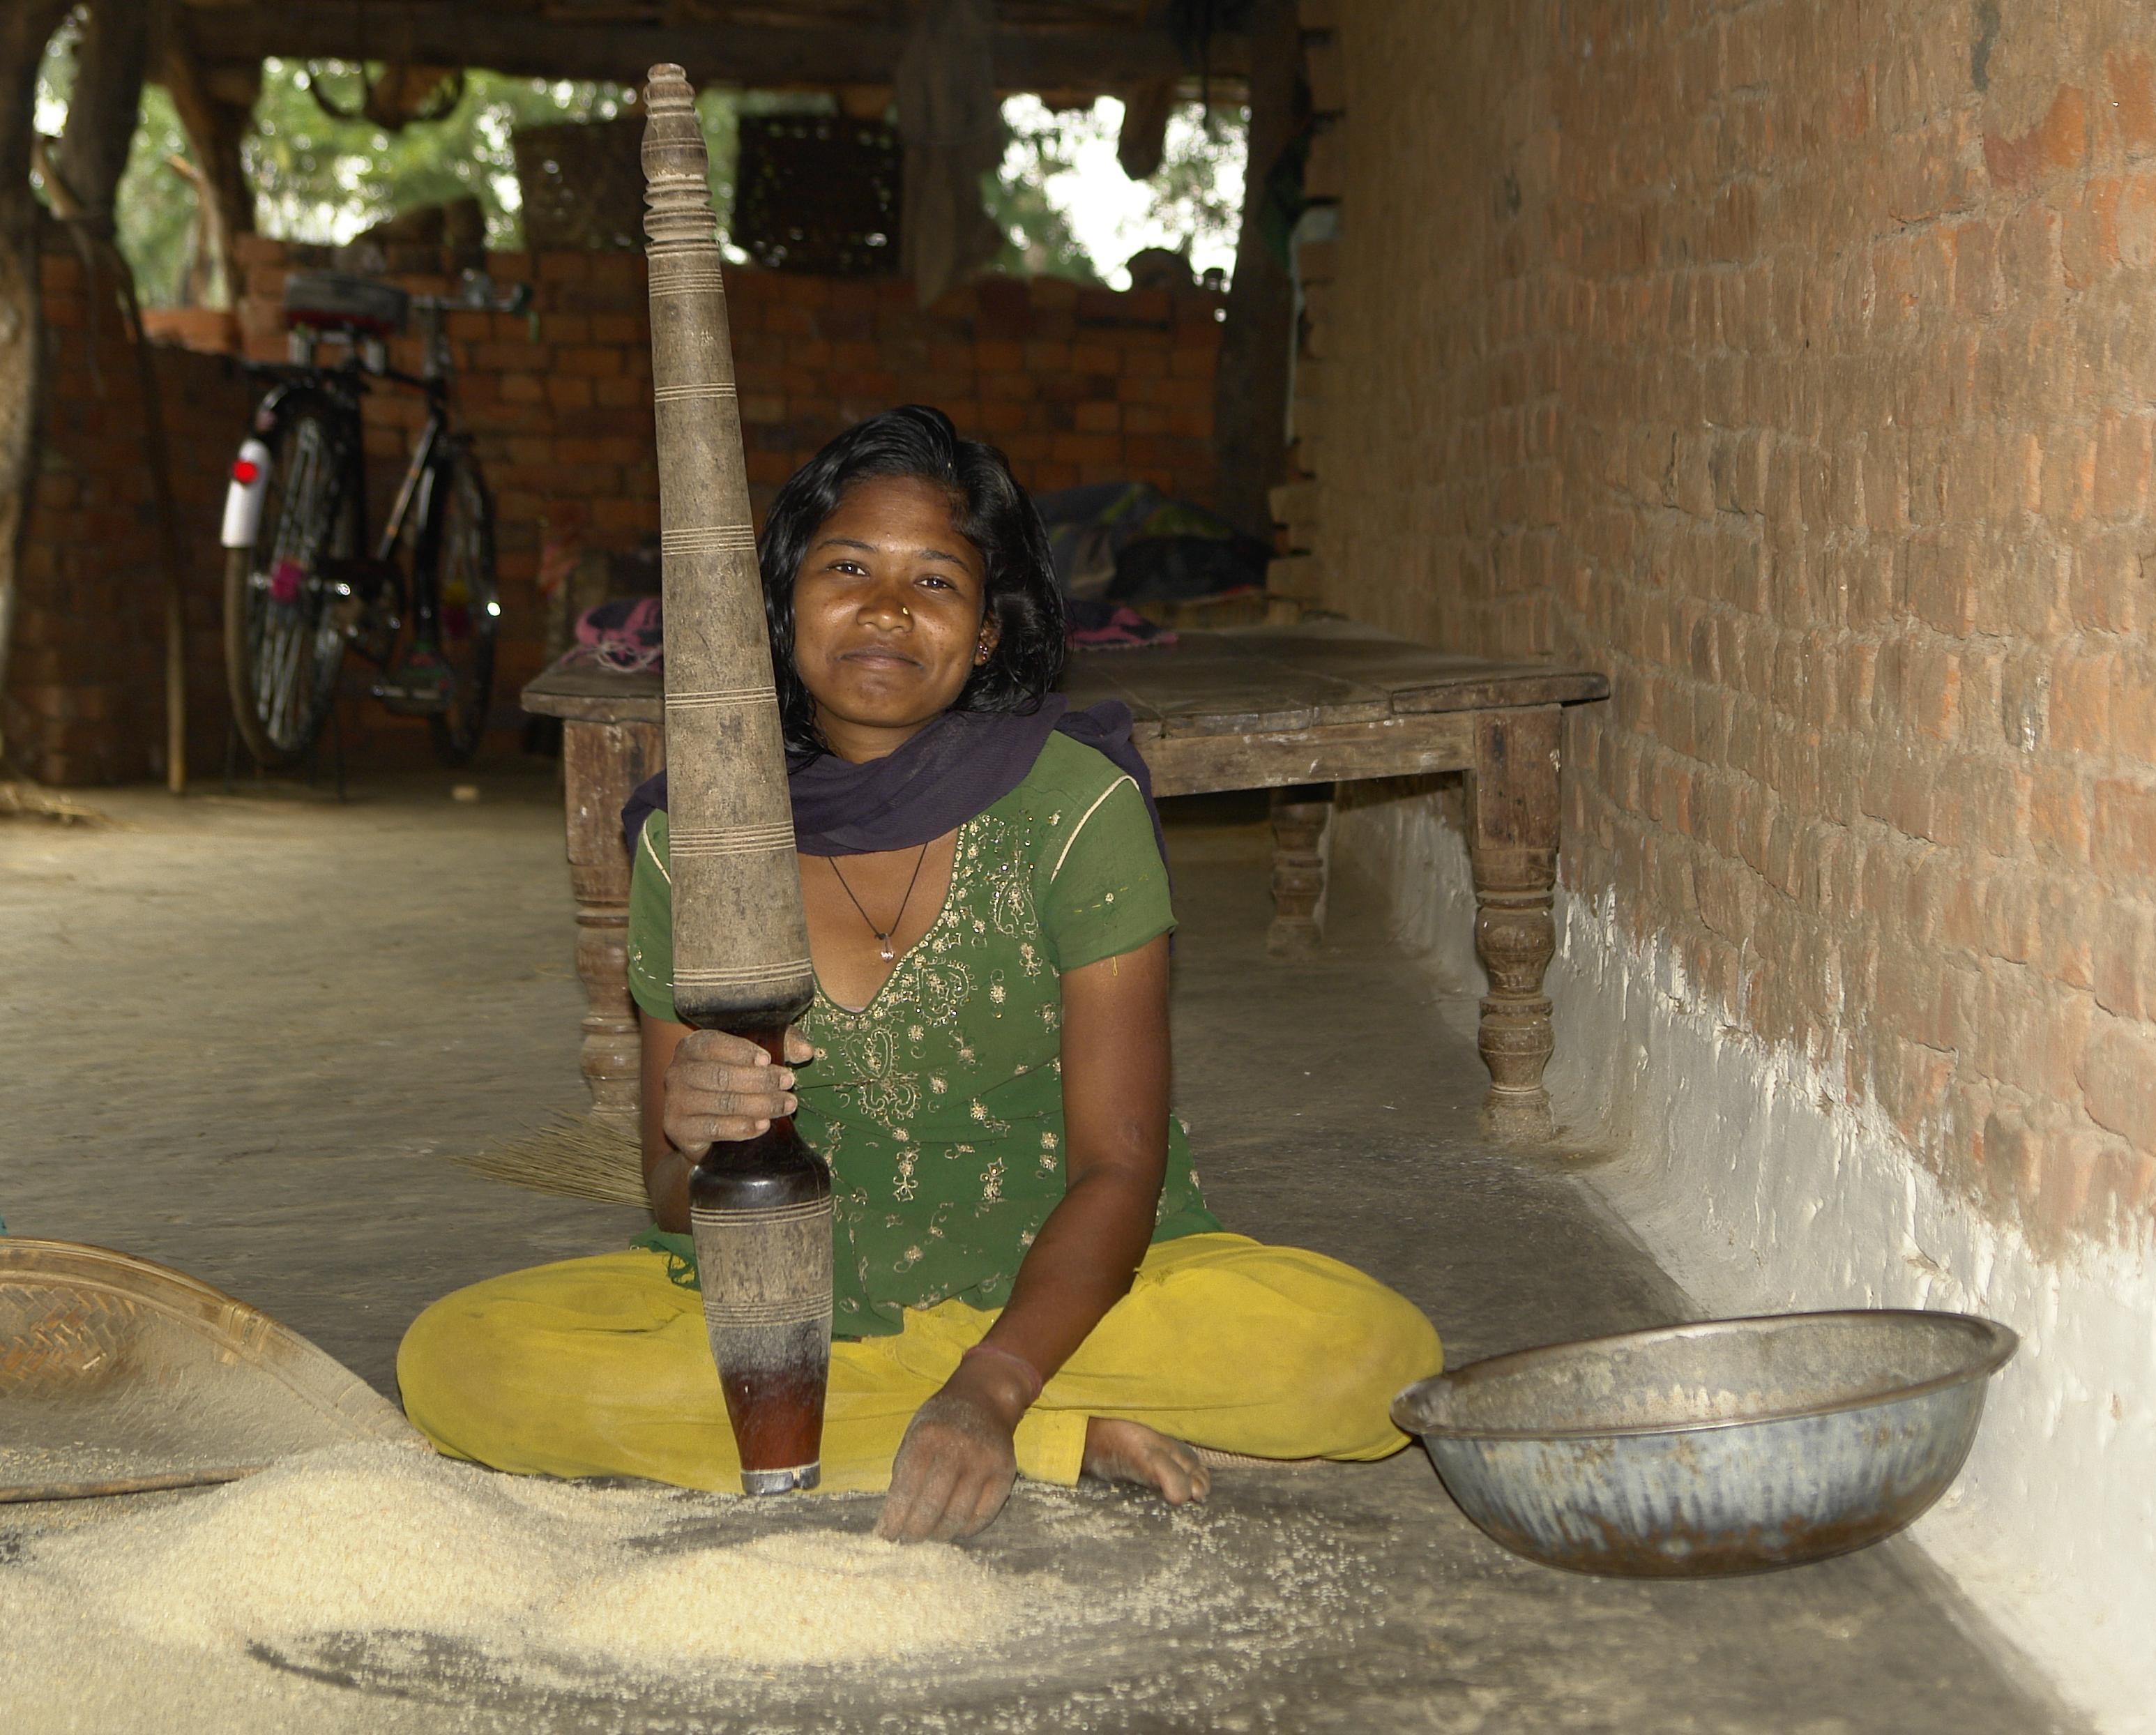 FileYoung Adivasi Woman Crushing Rice MP Indiajpg